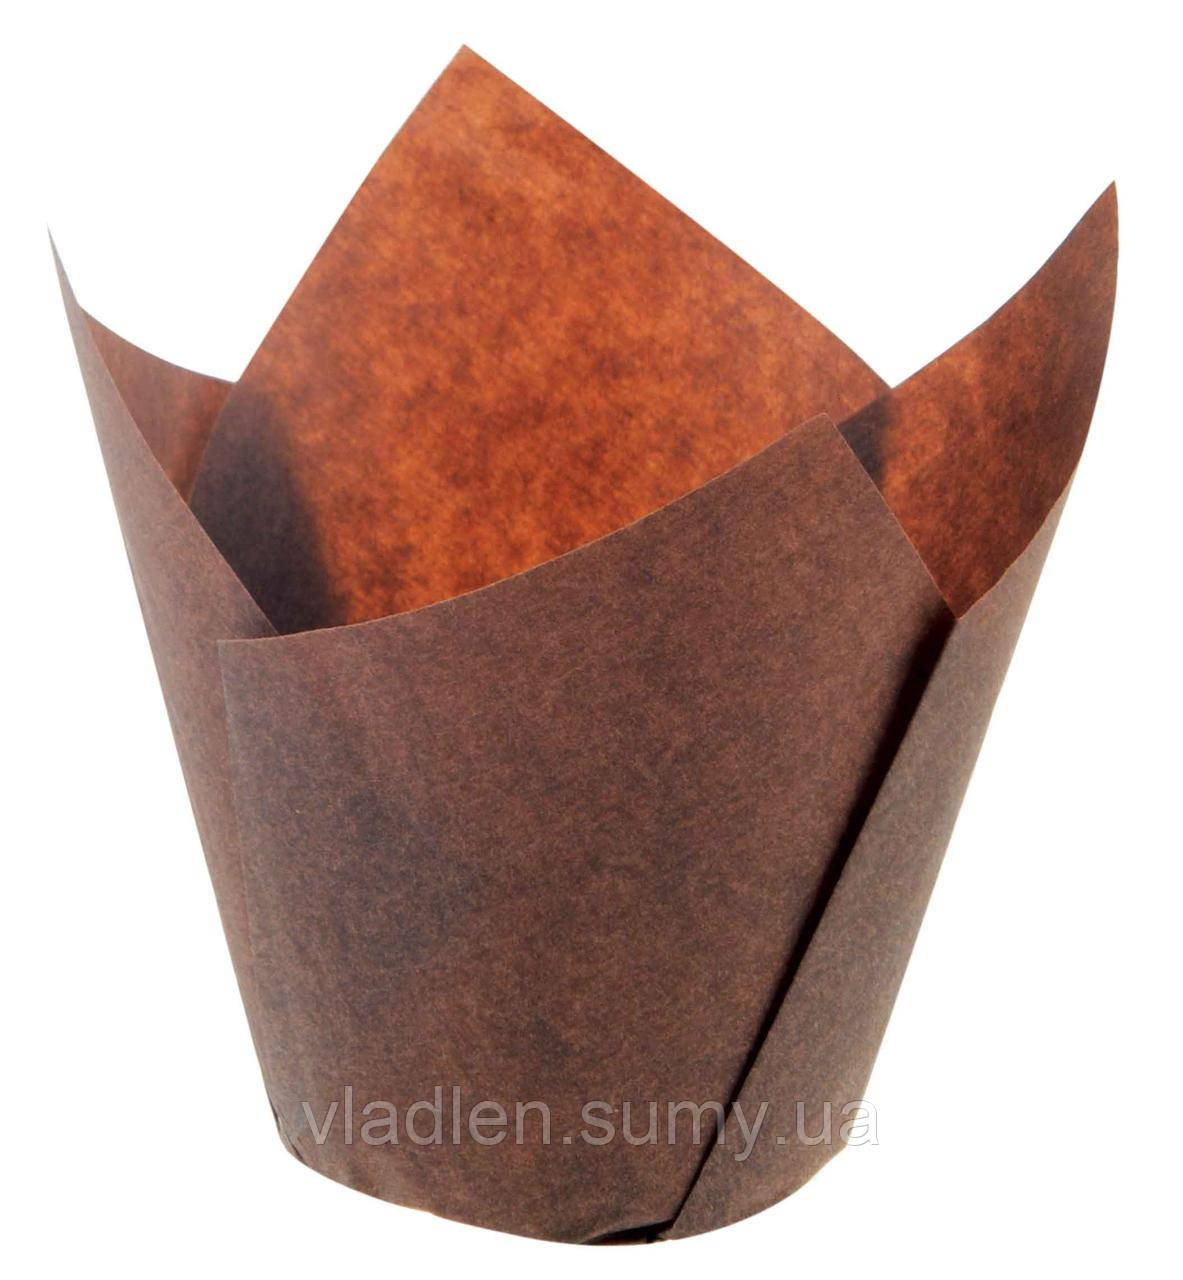 "Форма ""Экопак"" 715050В/1R форма для выпечки Тюльпан корич.150/50 (16*200шт)"